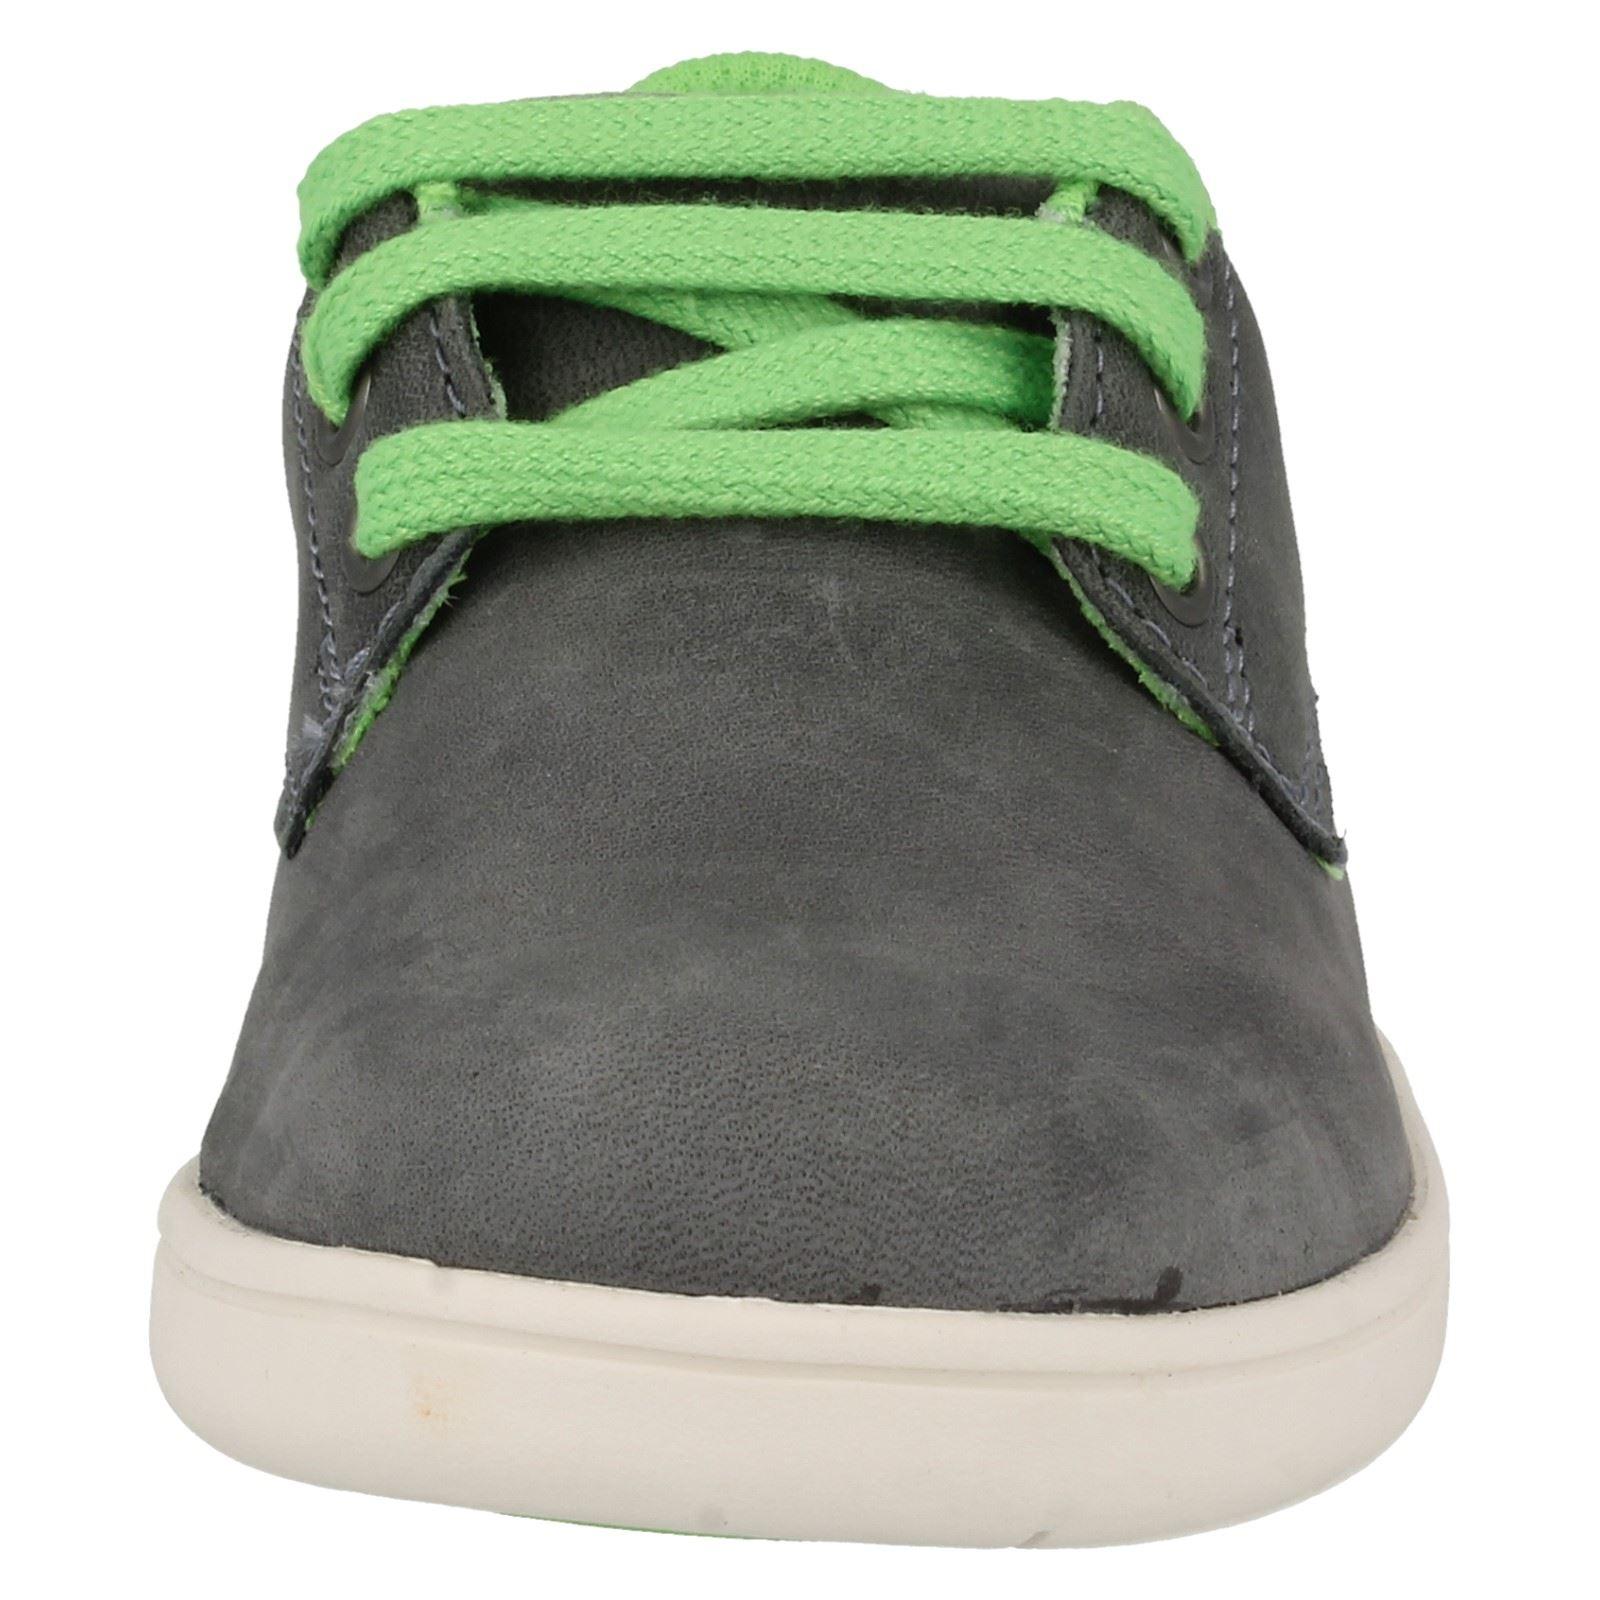 Boys Clarks Casual Shoes Holbay Fun